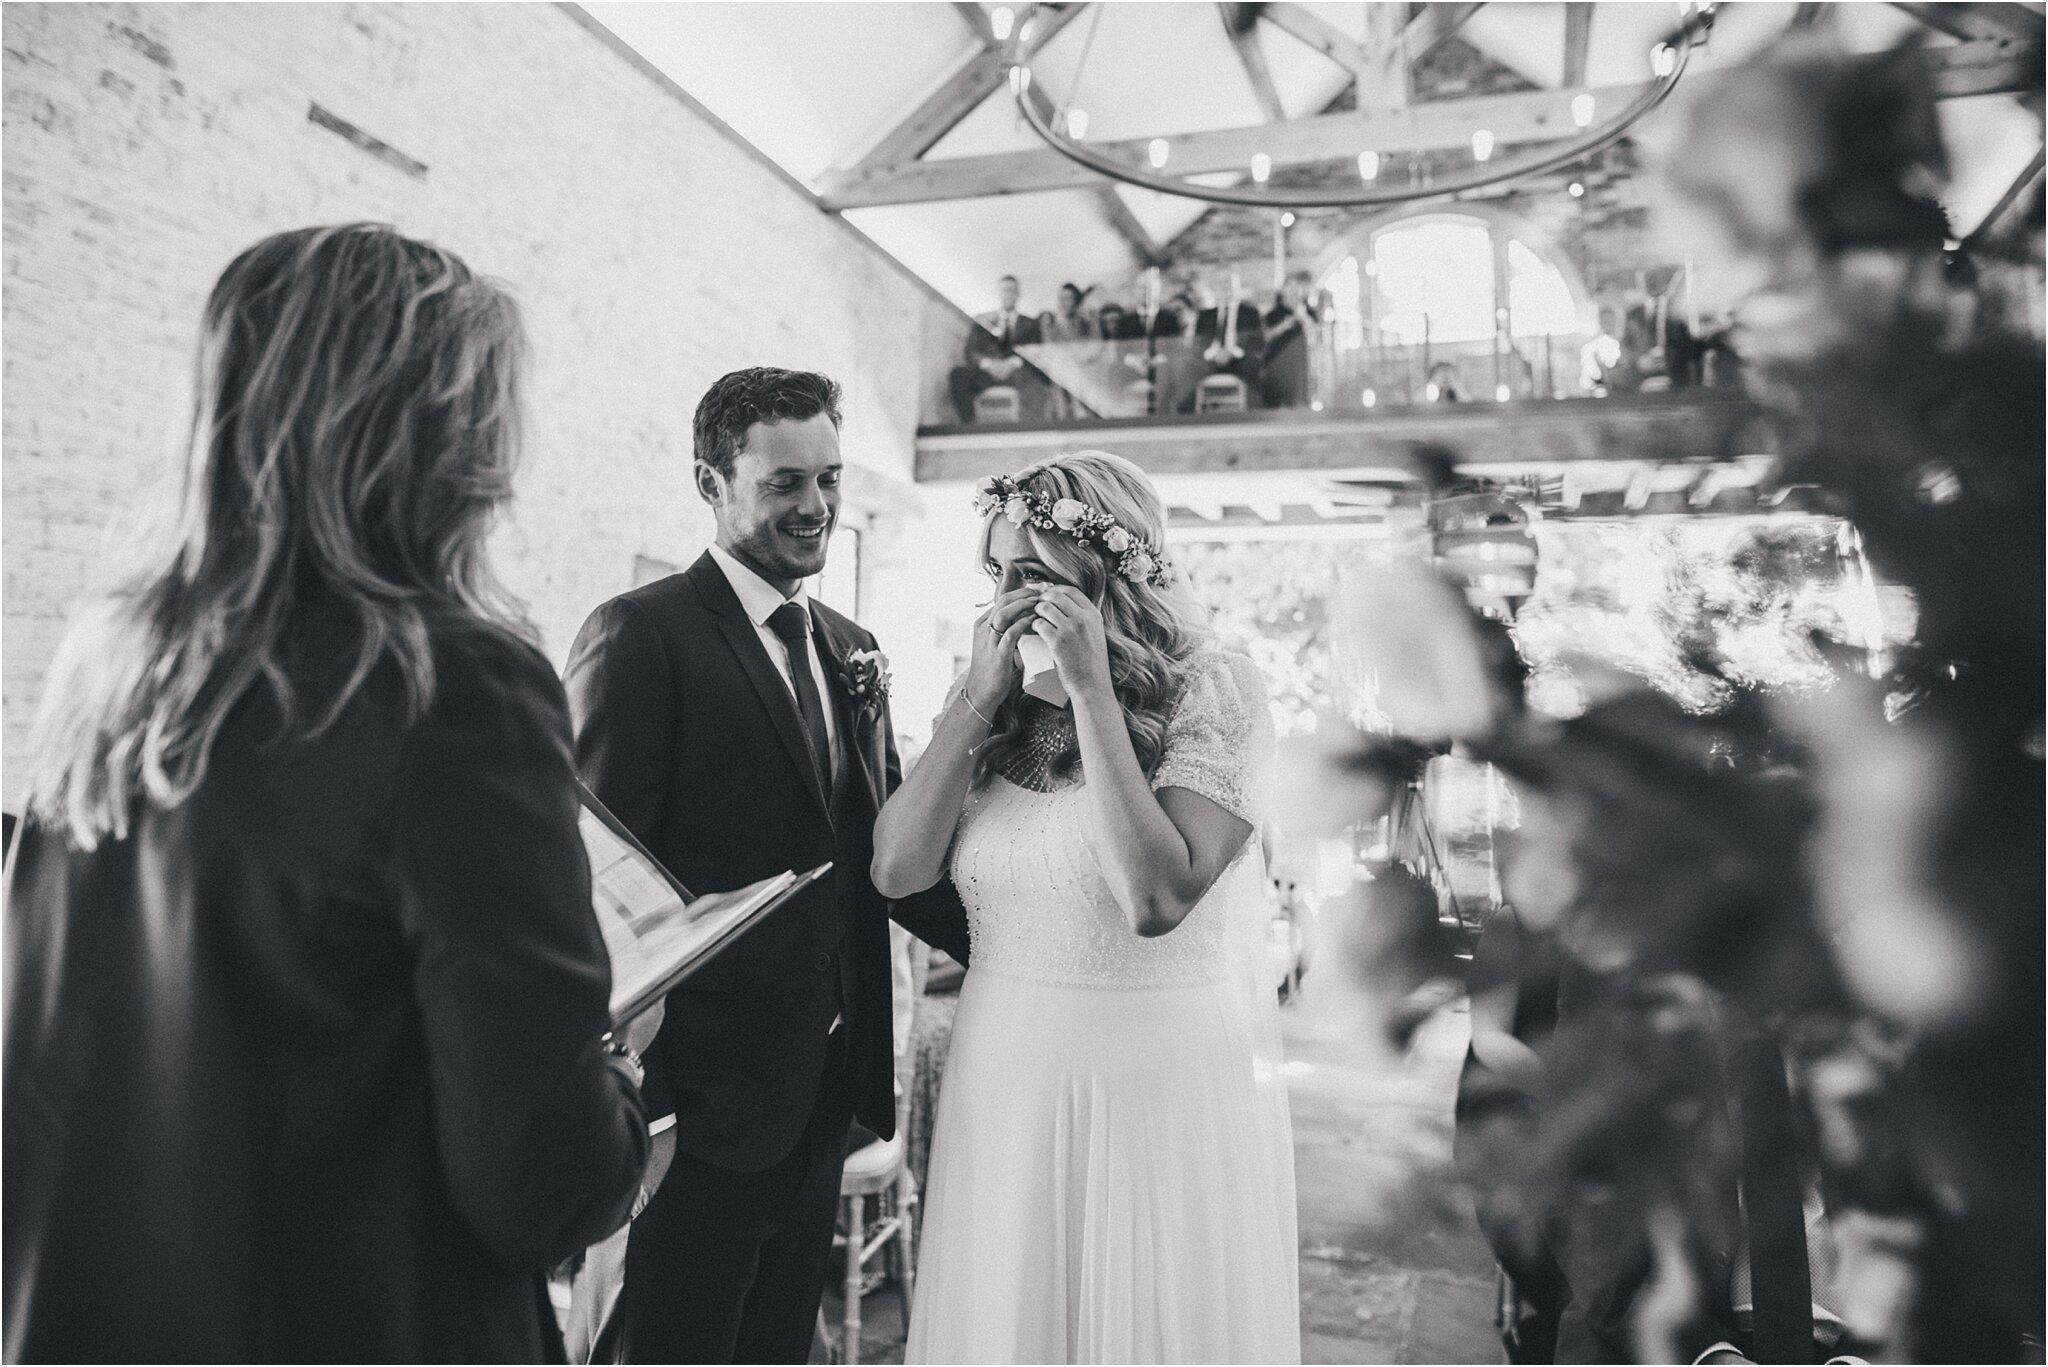 Dorfold Hall marquee wedding 00018.jpg